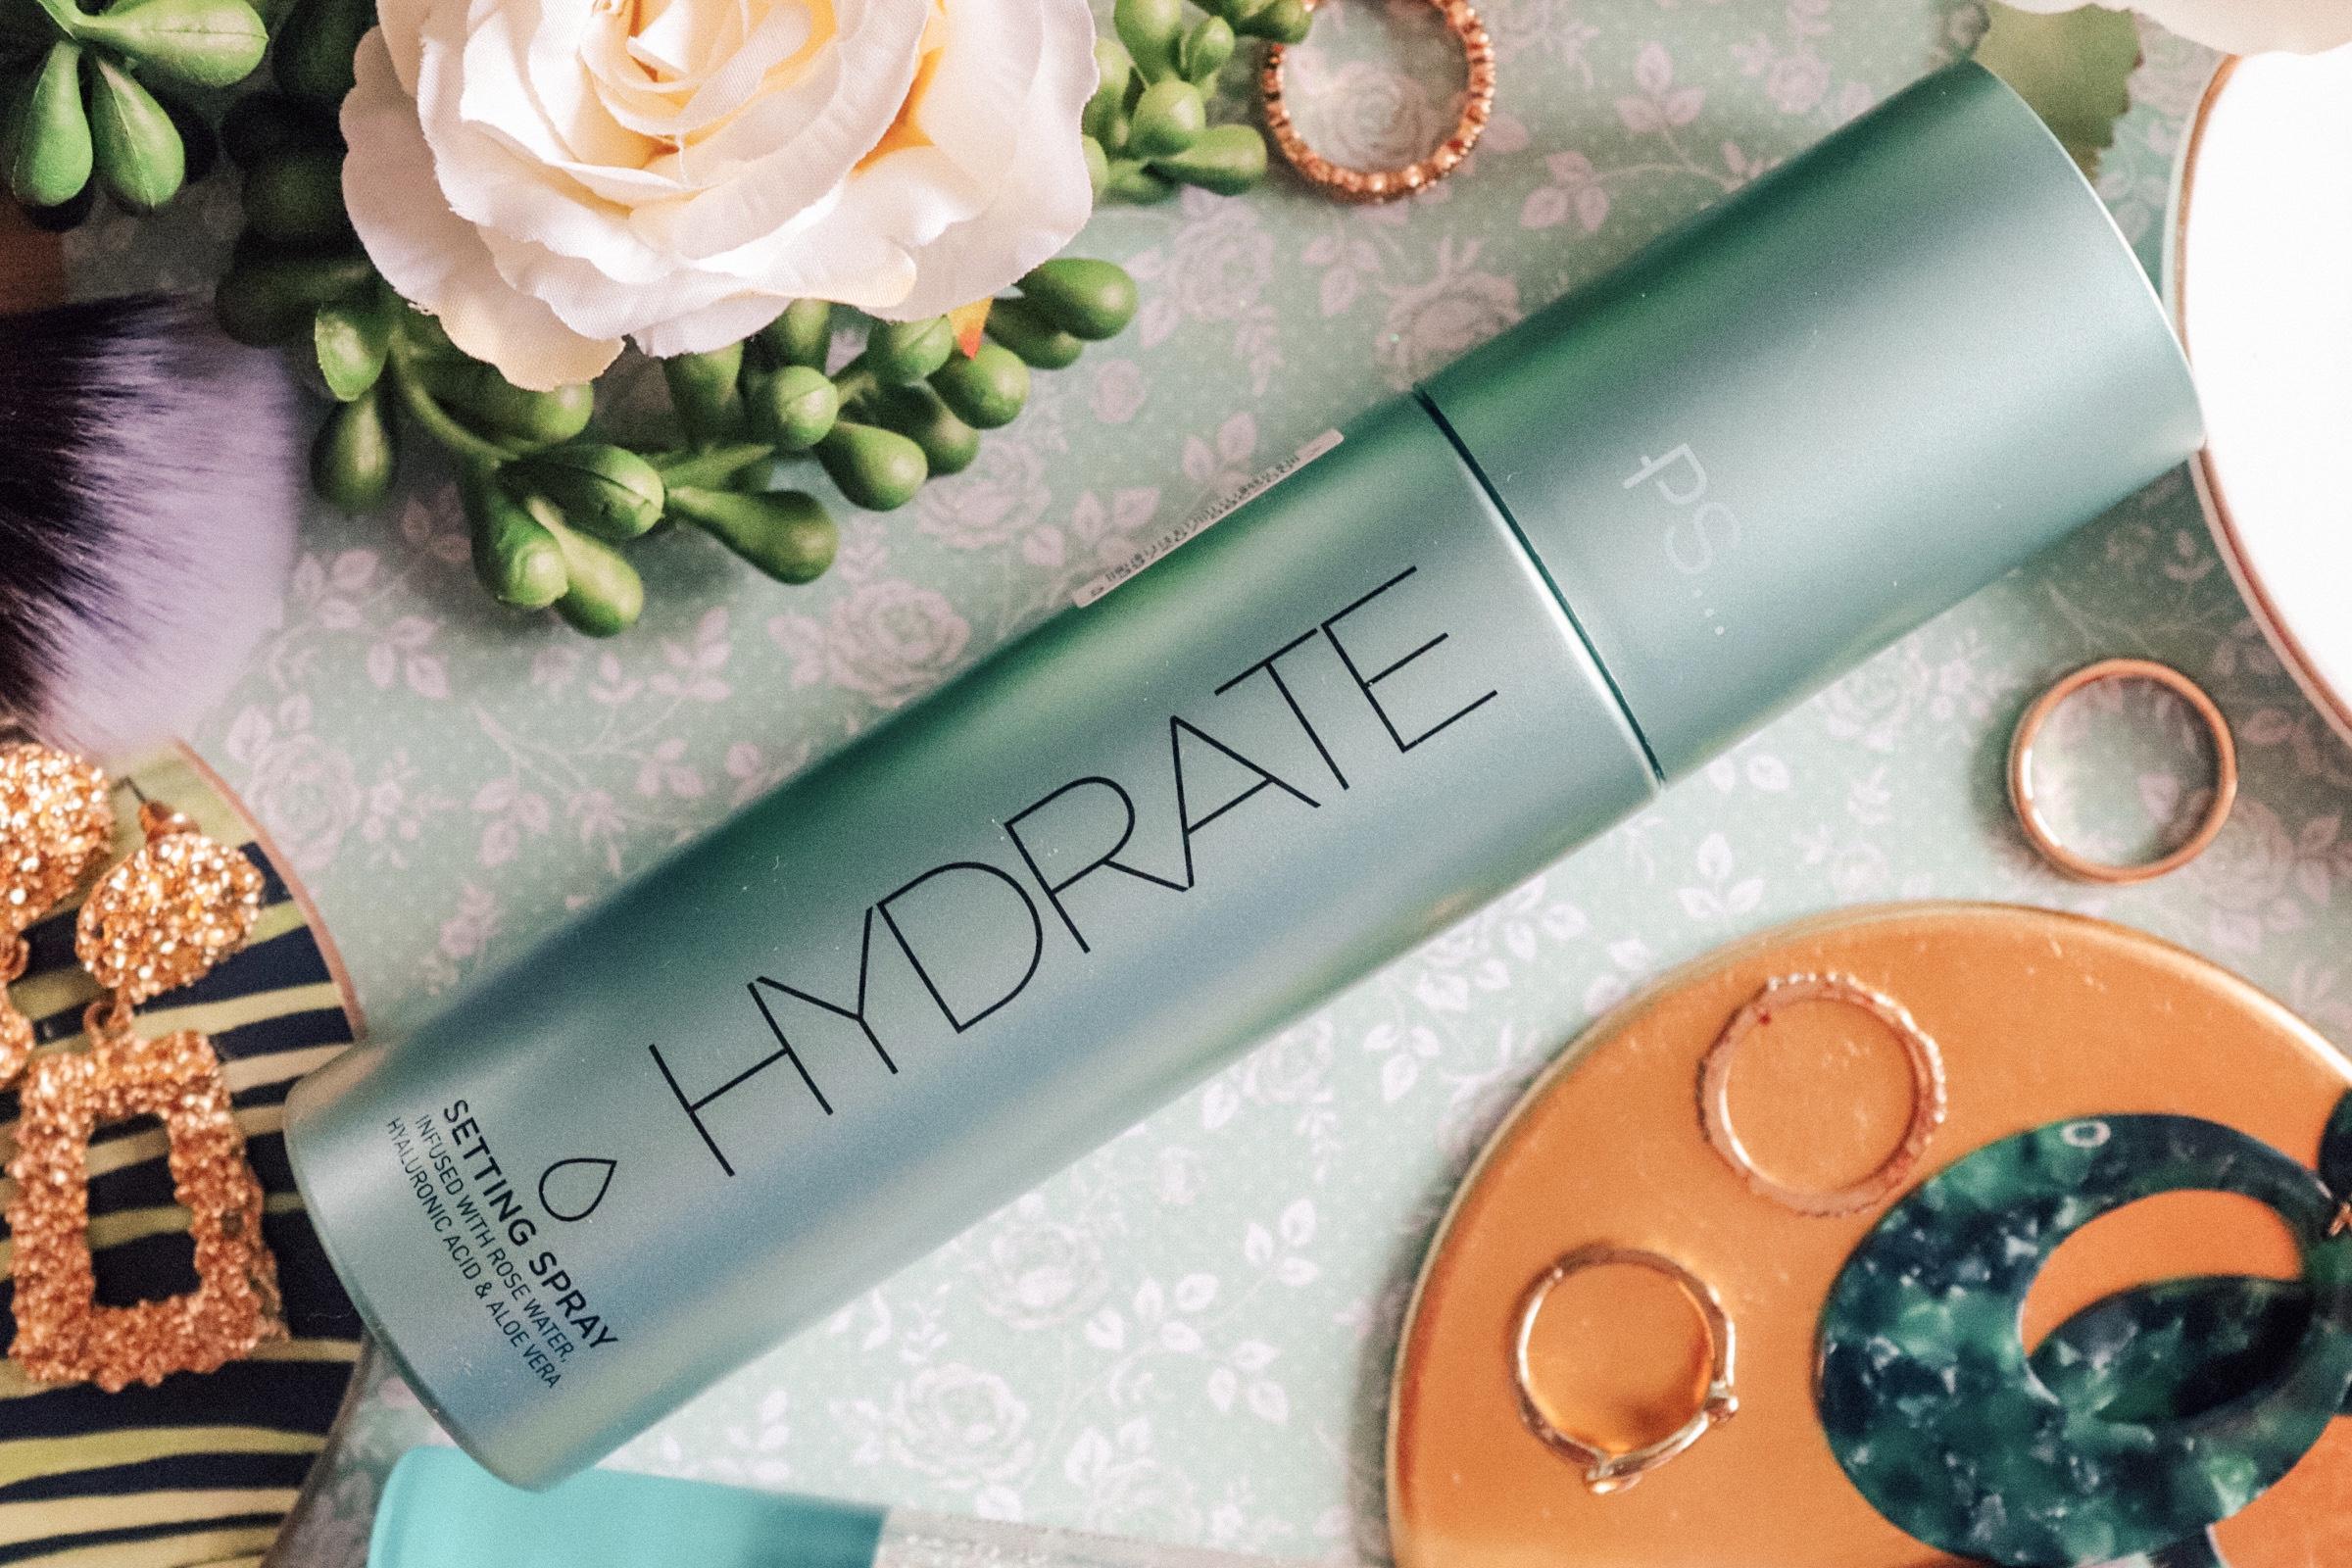 TESTING PRIMARK'S – 'HYDRATE' SETTING SPRAY